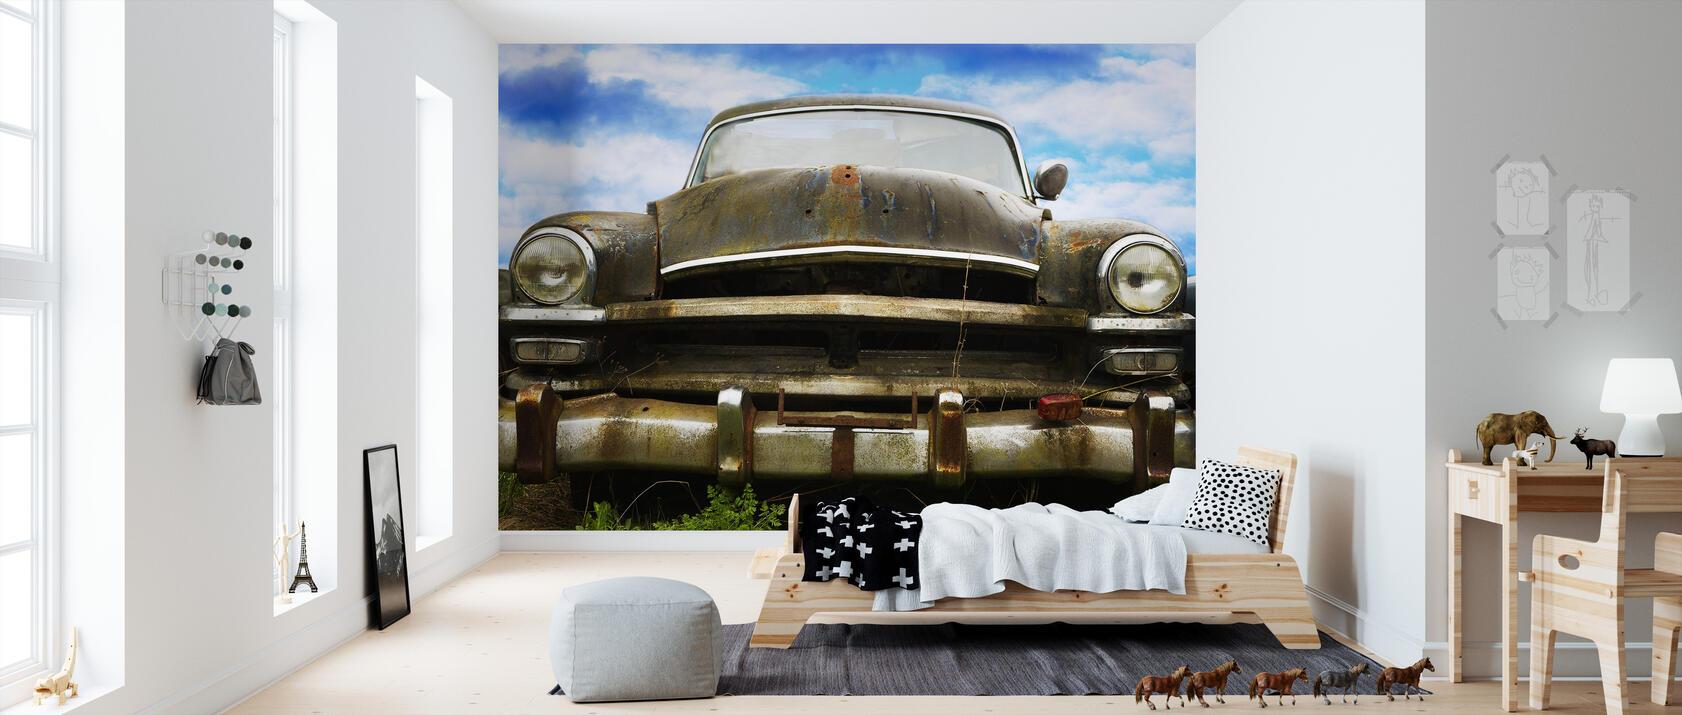 rusty old car popul r fototapet photowall. Black Bedroom Furniture Sets. Home Design Ideas